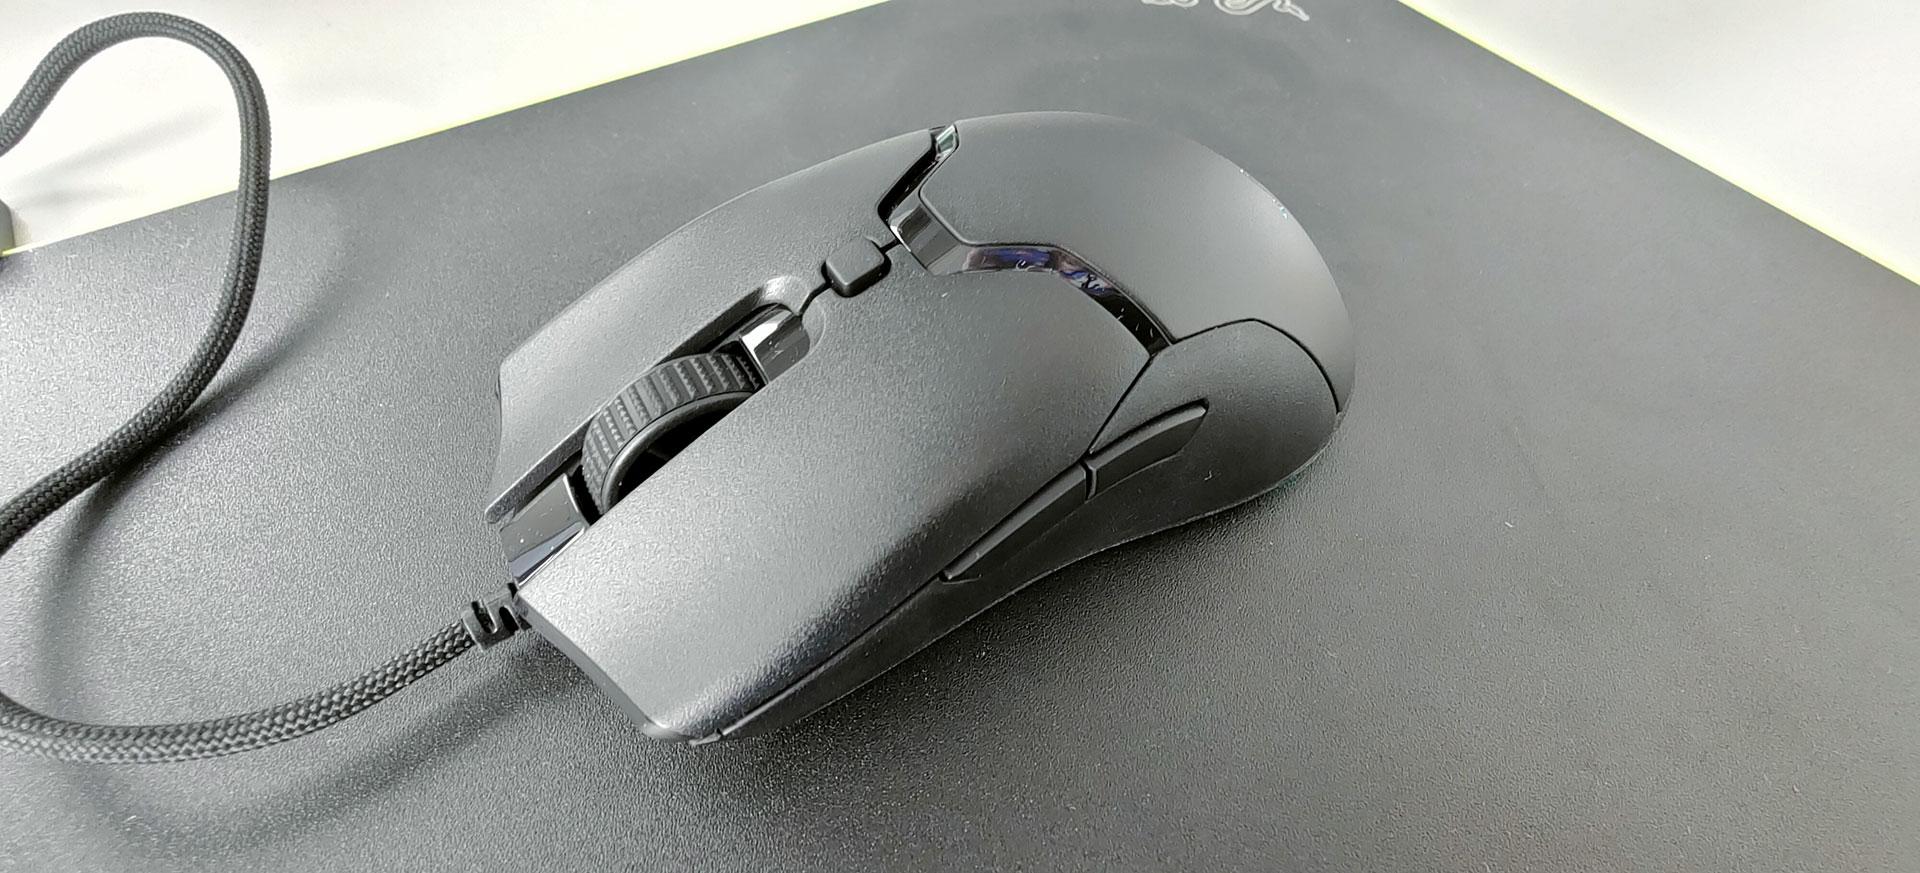 Razer Viper Mini Voorkant